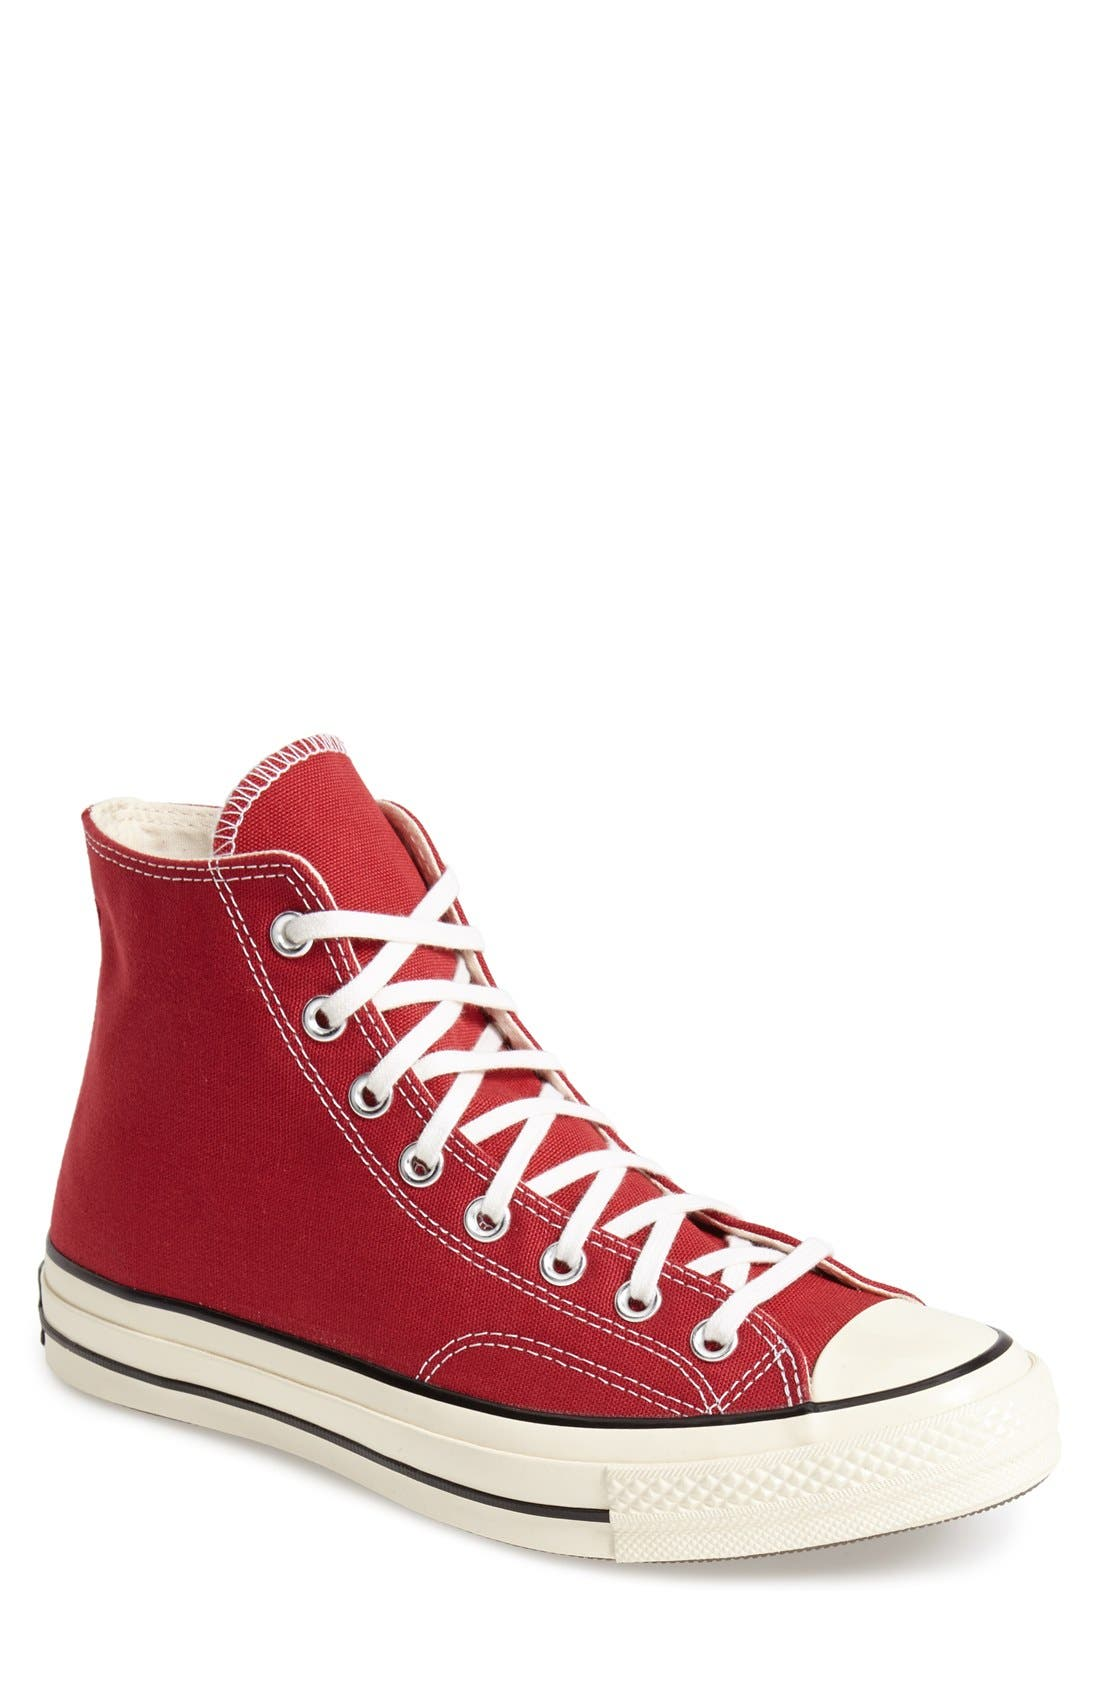 Chuck Taylor<sup>®</sup> All Star<sup>®</sup> '70 High Sneaker,                             Main thumbnail 3, color,